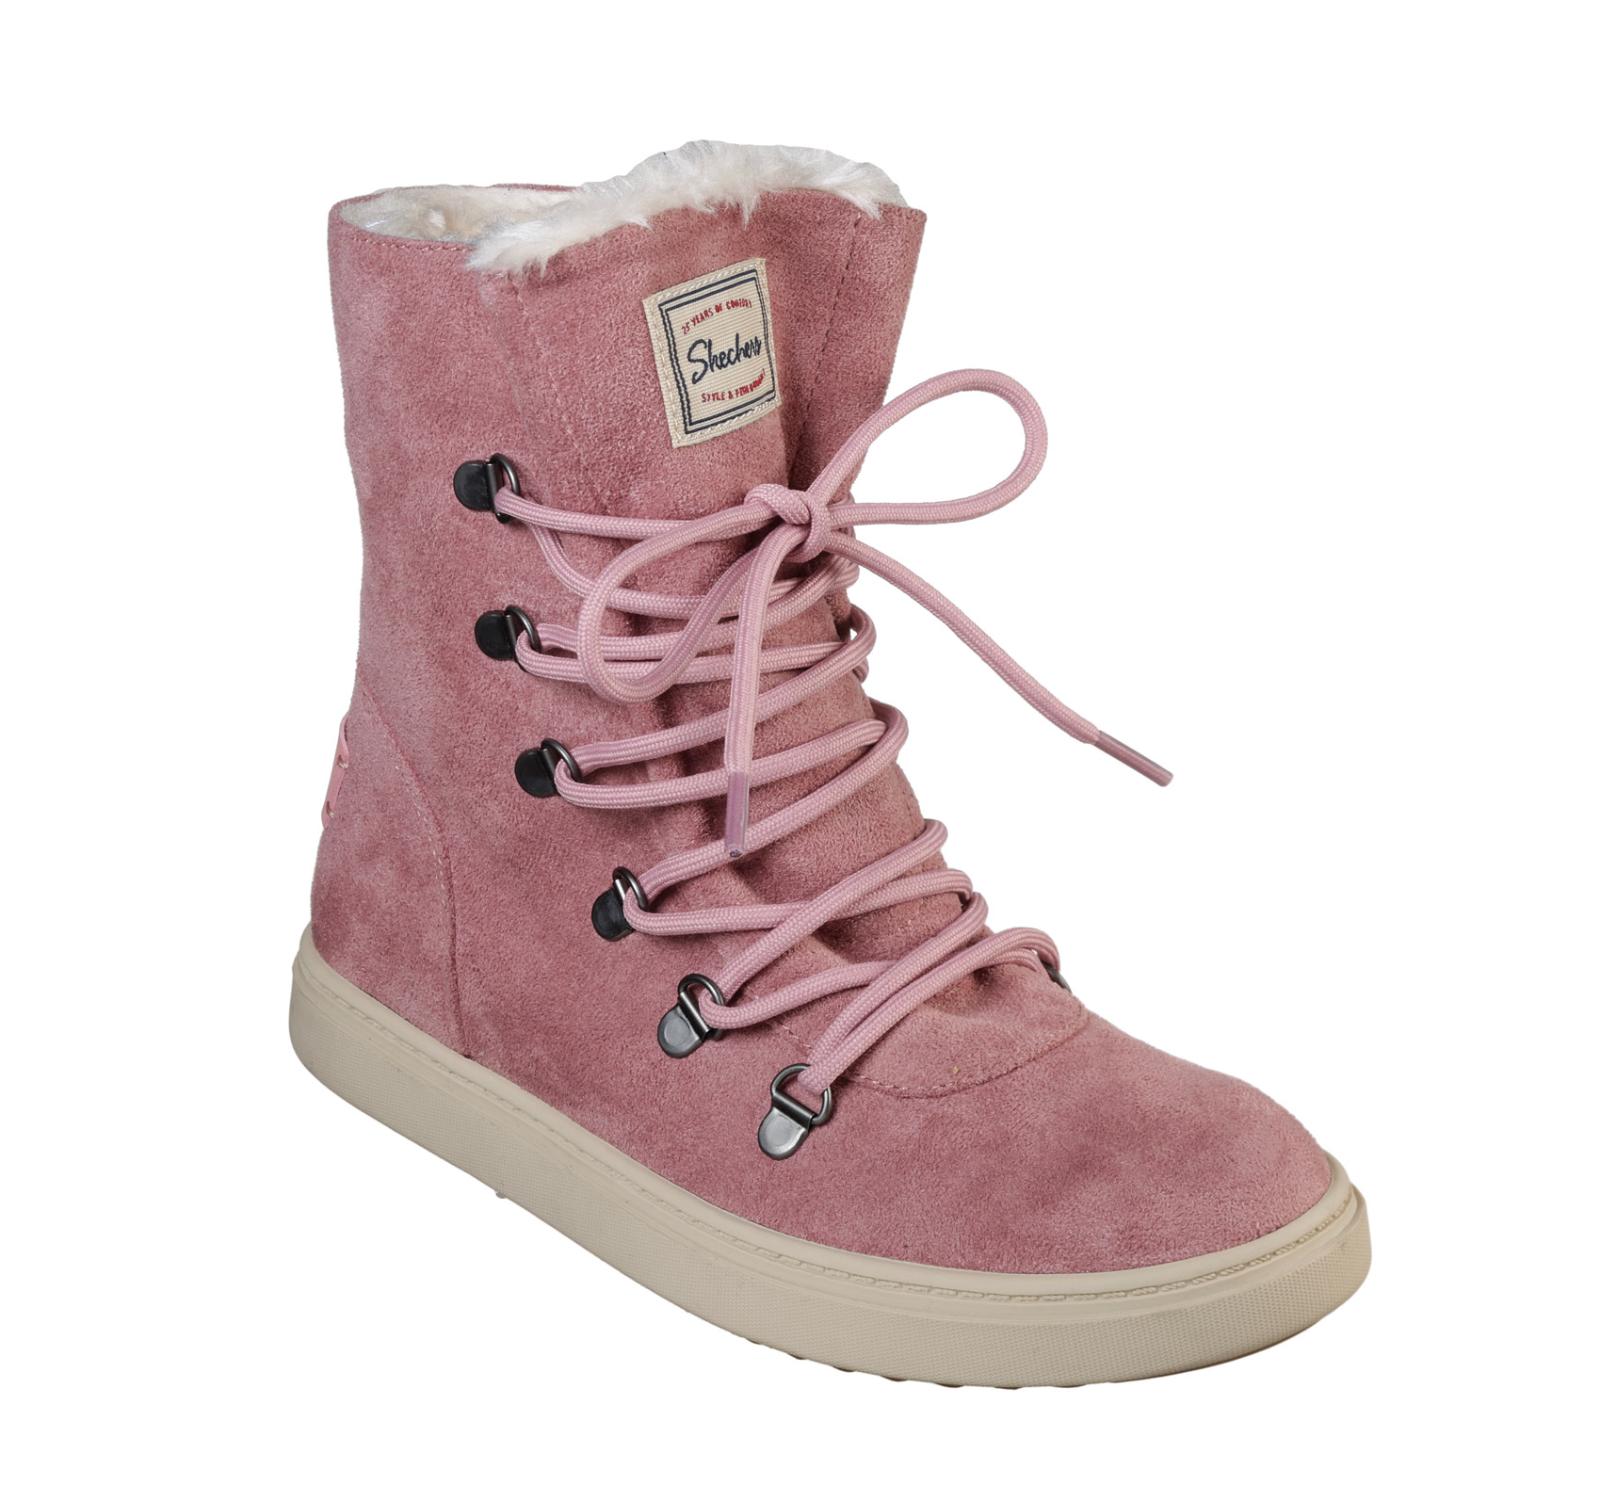 Skechers NEW Keepsneak Avalanche Rosa Rosa Rosa faux suede memory foam ankle Stiefel siz 3-8 6e1b27